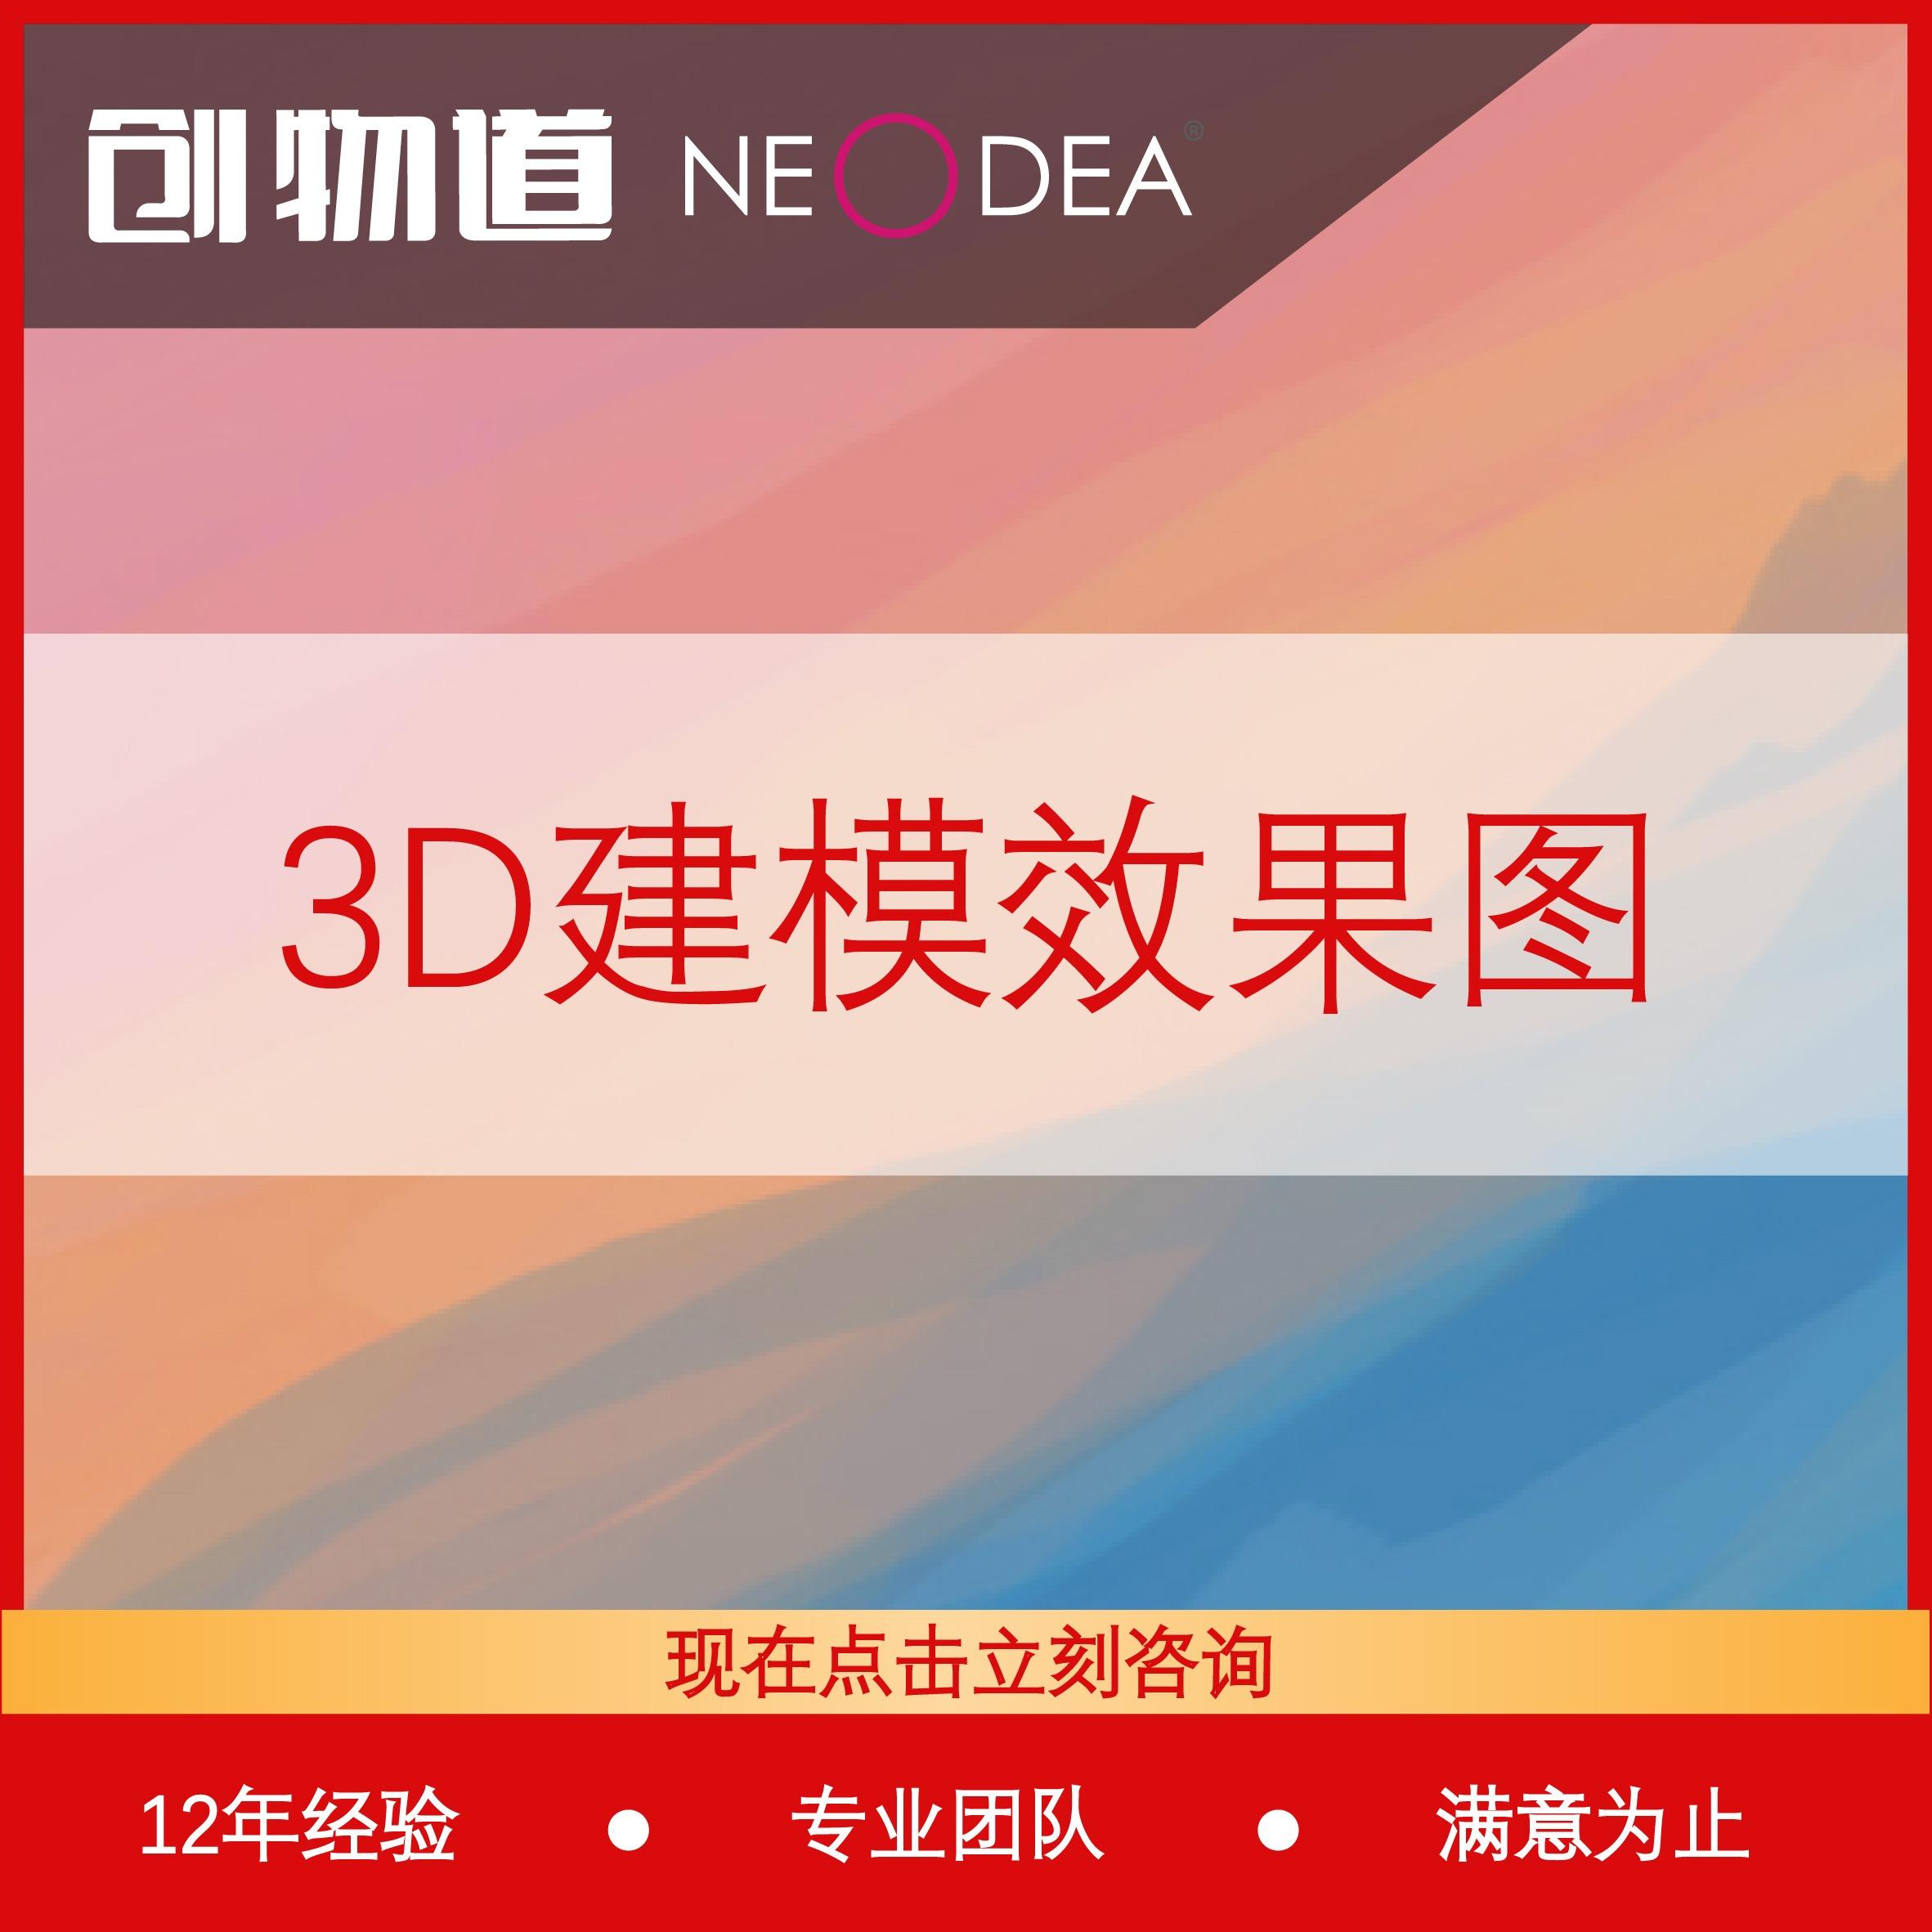 3dmax建模塑料模具web3d三维扫描五金集成电路cad图